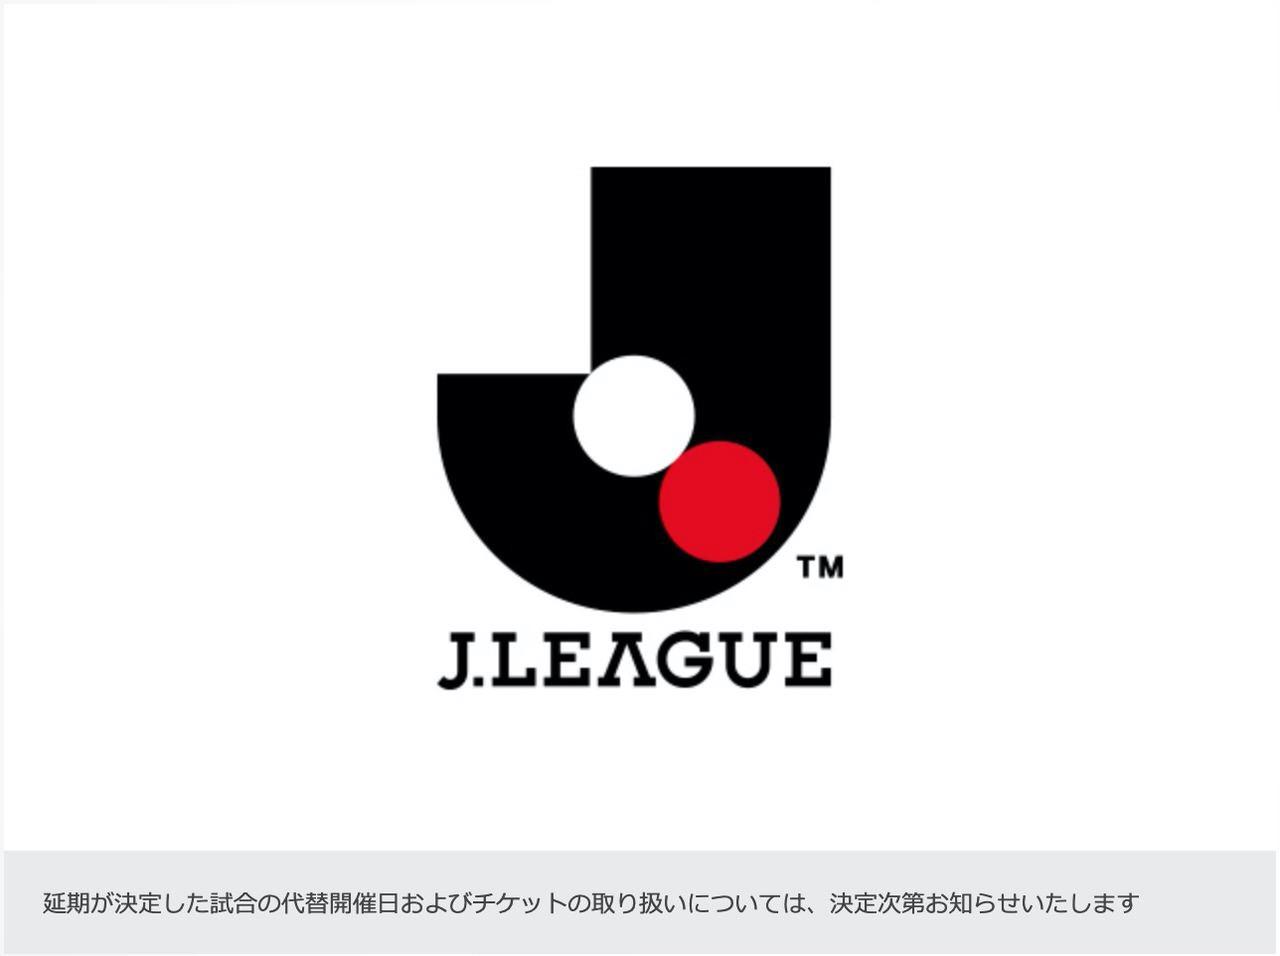 【Jリーグ】新型コロナウイルスの影響により2月26日のルヴァンカップ開催が延期に(リーグ戦も延期か)